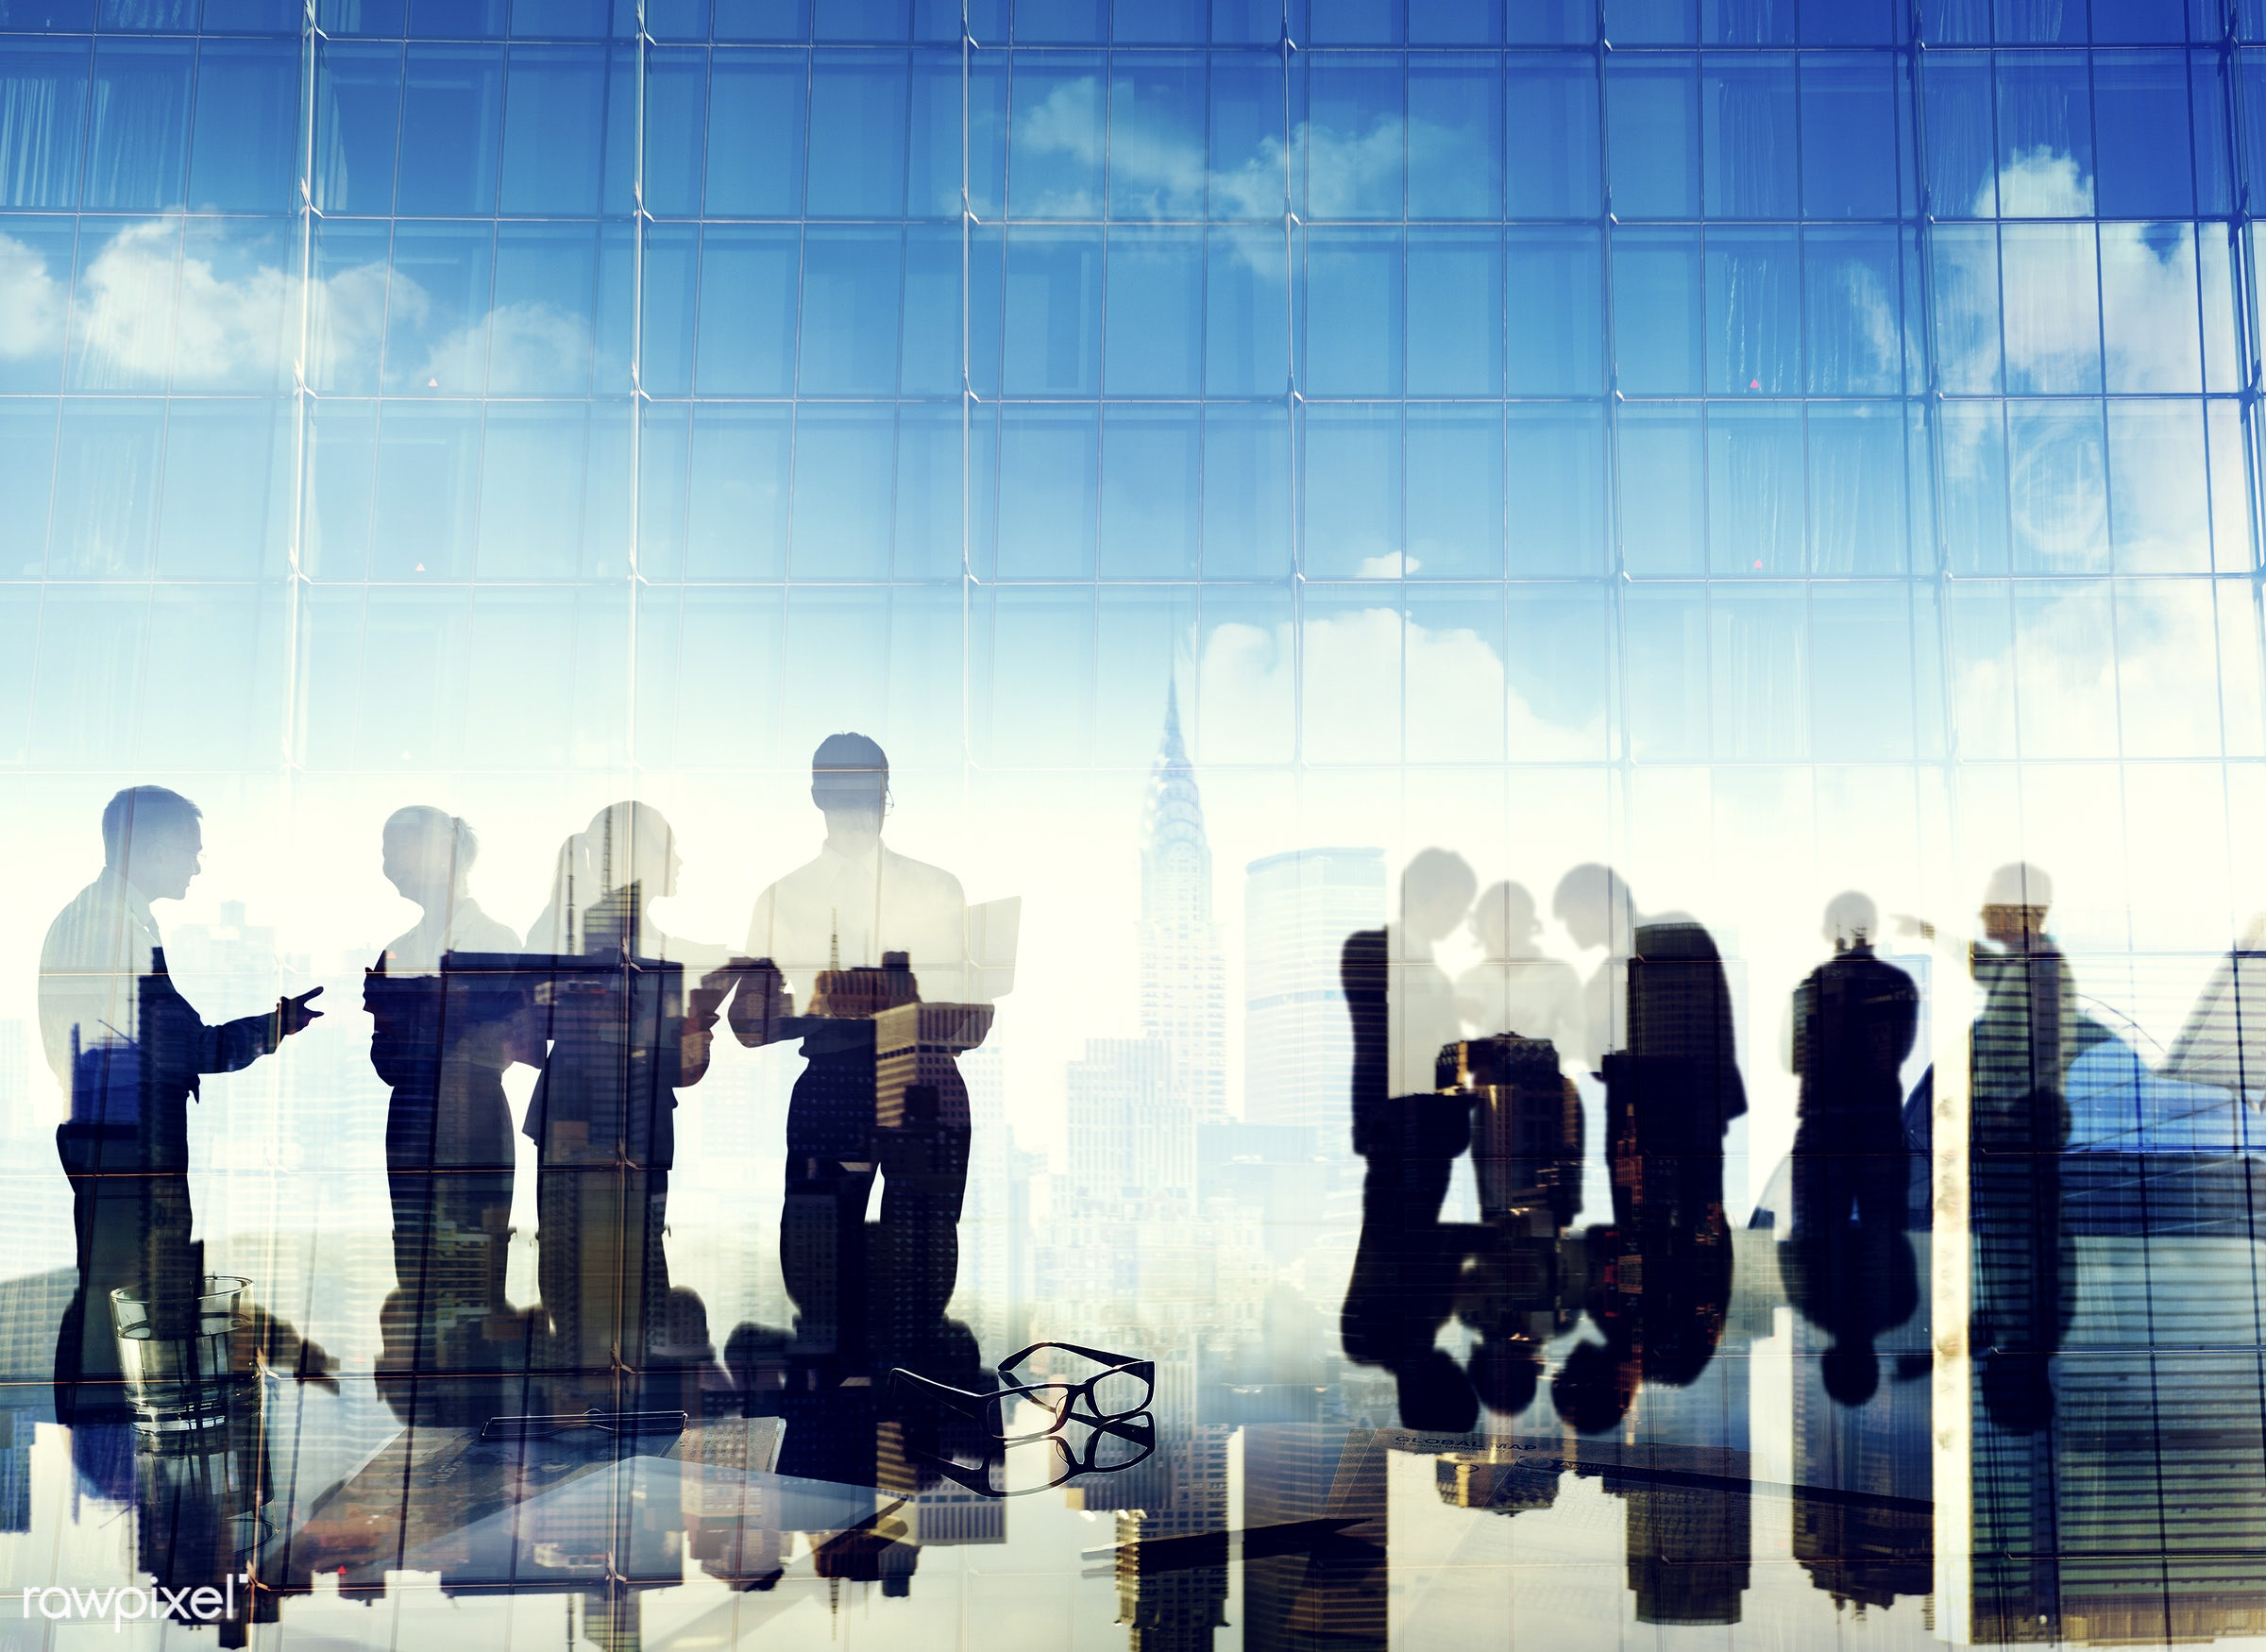 brainstorming, building, business, business people, business person, businessmen, businesswomen, busy, city, colleague,...